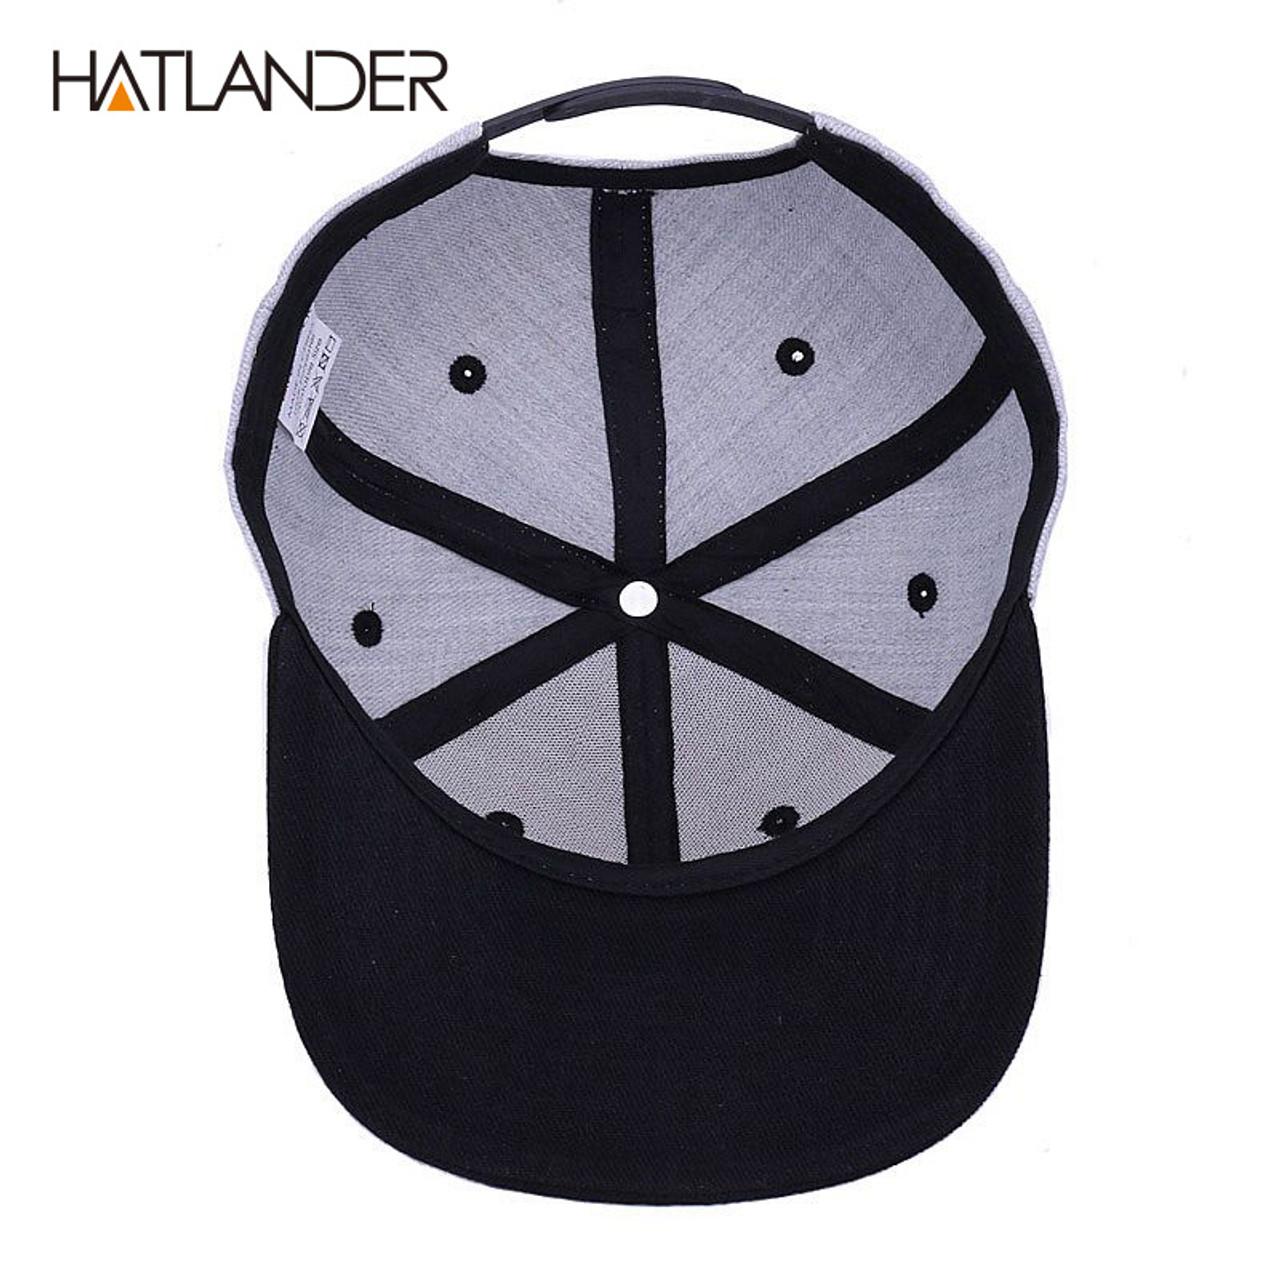 68e10d0deee ...  HATLANDER Original grey cool hip hop cap men women hats vintage  embroidery character baseball ...